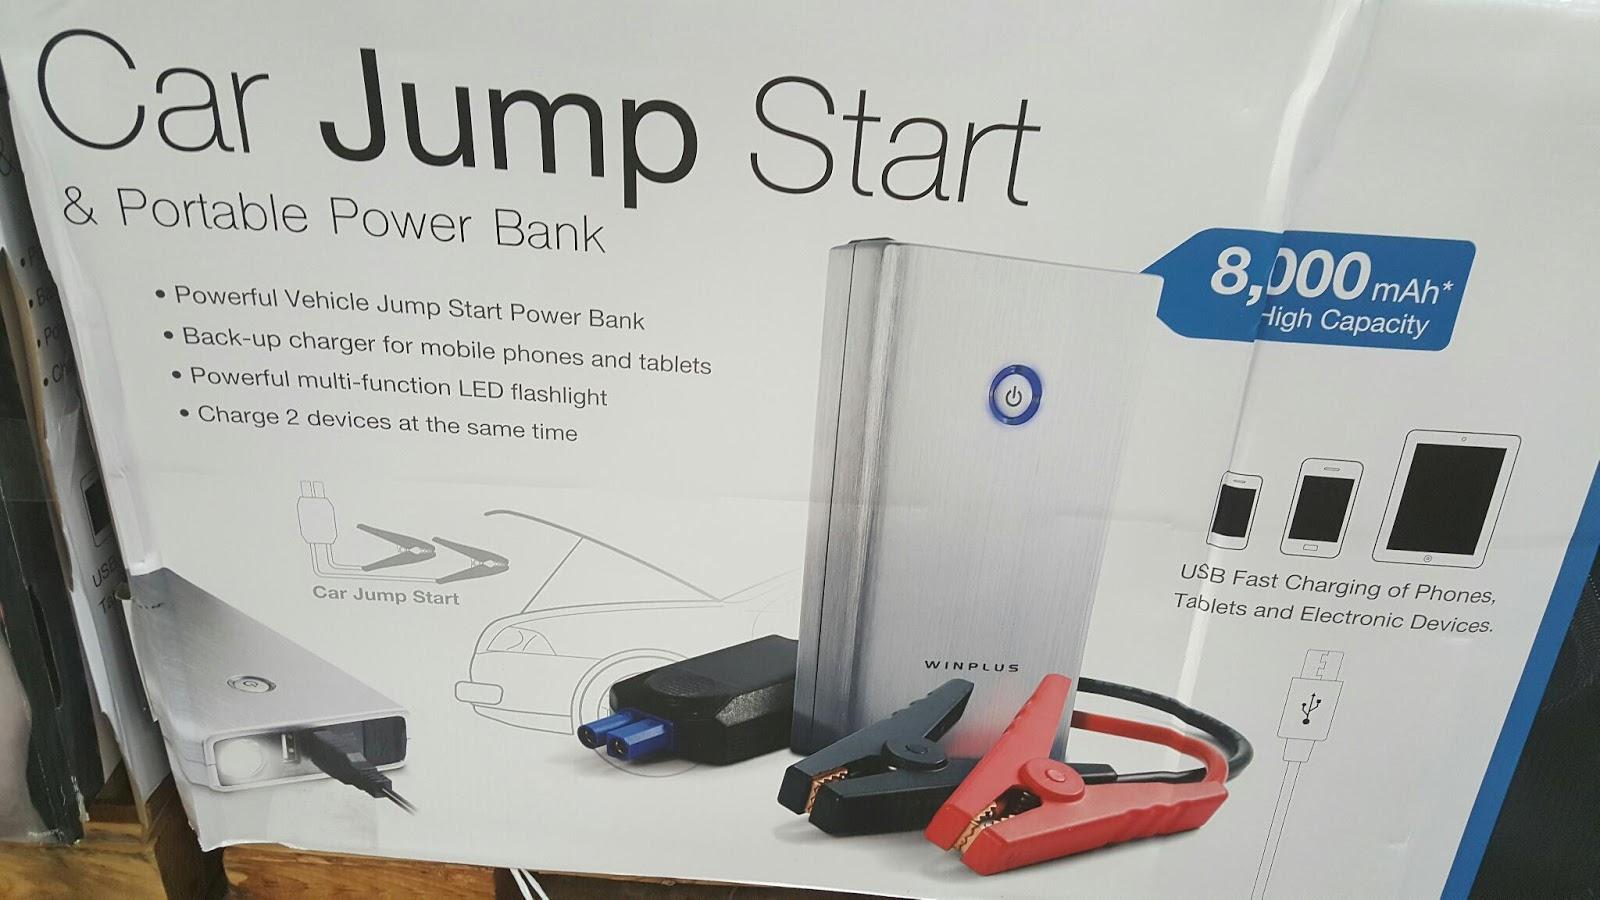 1750766 Lithium Jump Starter Portable Power Bank Costco Addiction